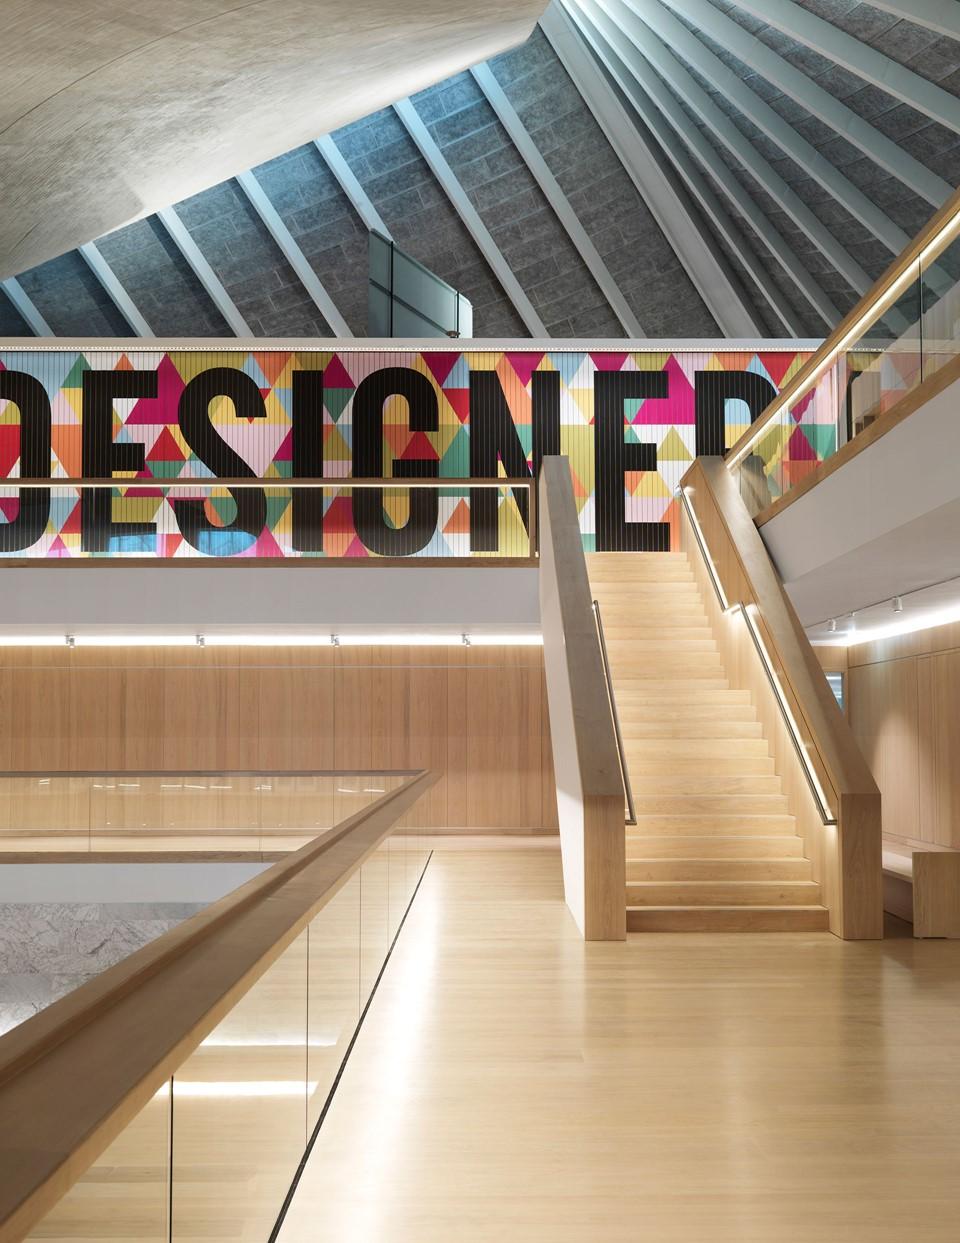 oak-flooring-grandoak_light-oil-laquer_the-design-museum_stairs_dinesen_08.jpg